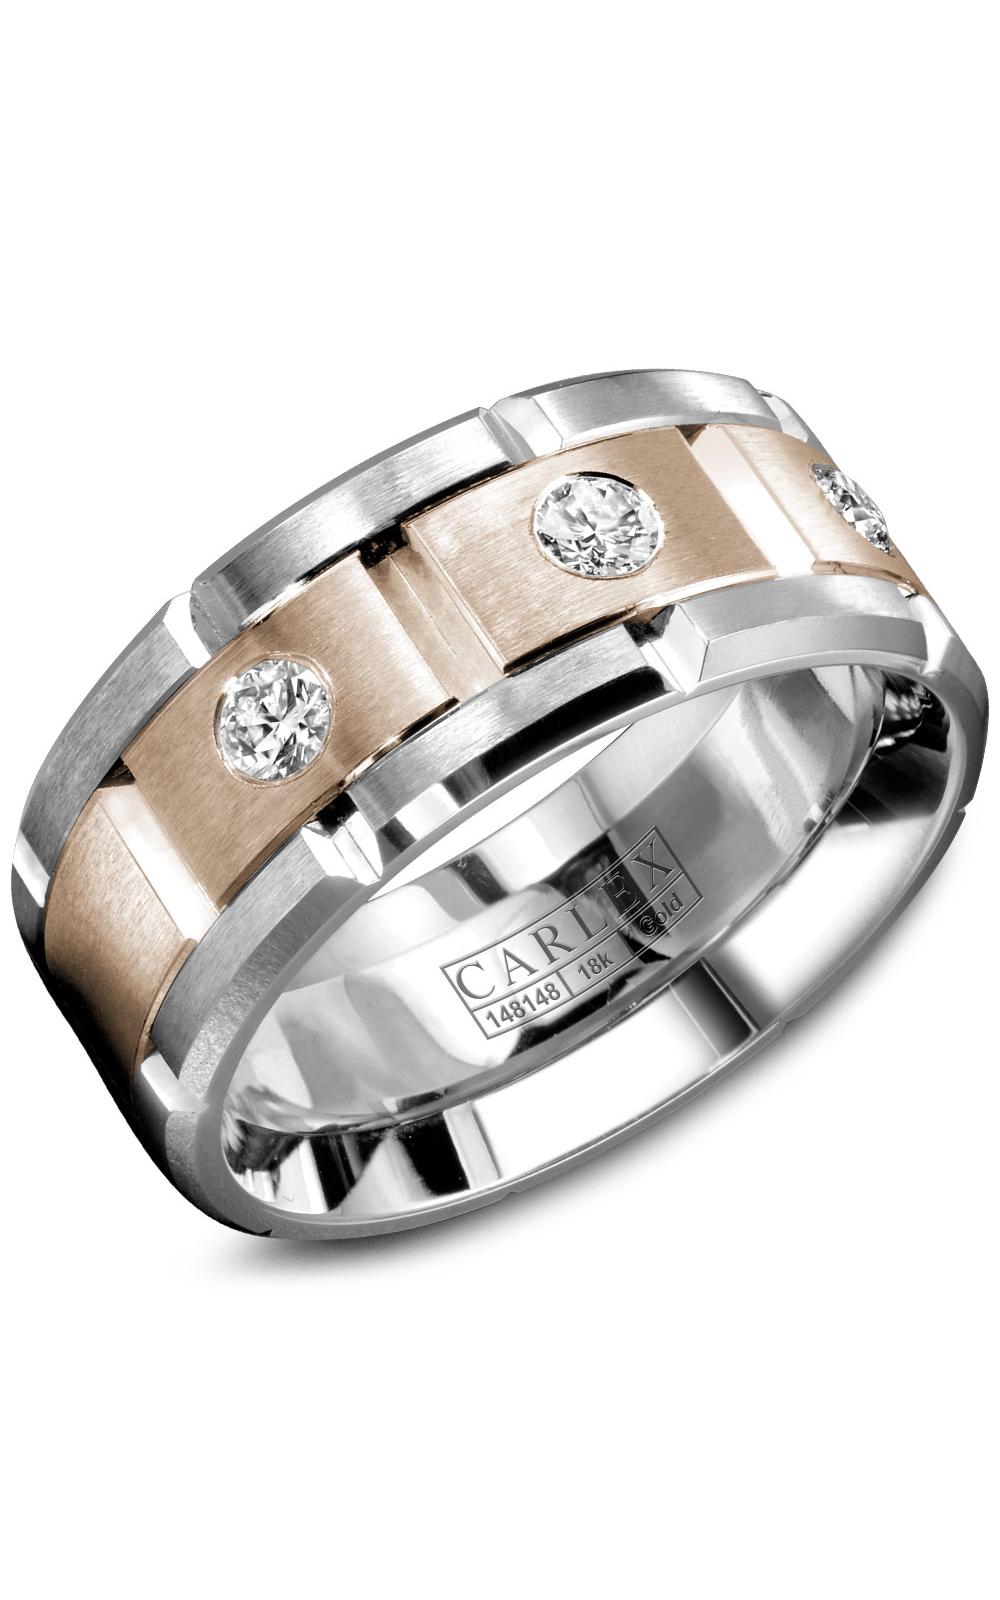 Carlex G1 Men's Wedding Band WB-9211RW product image